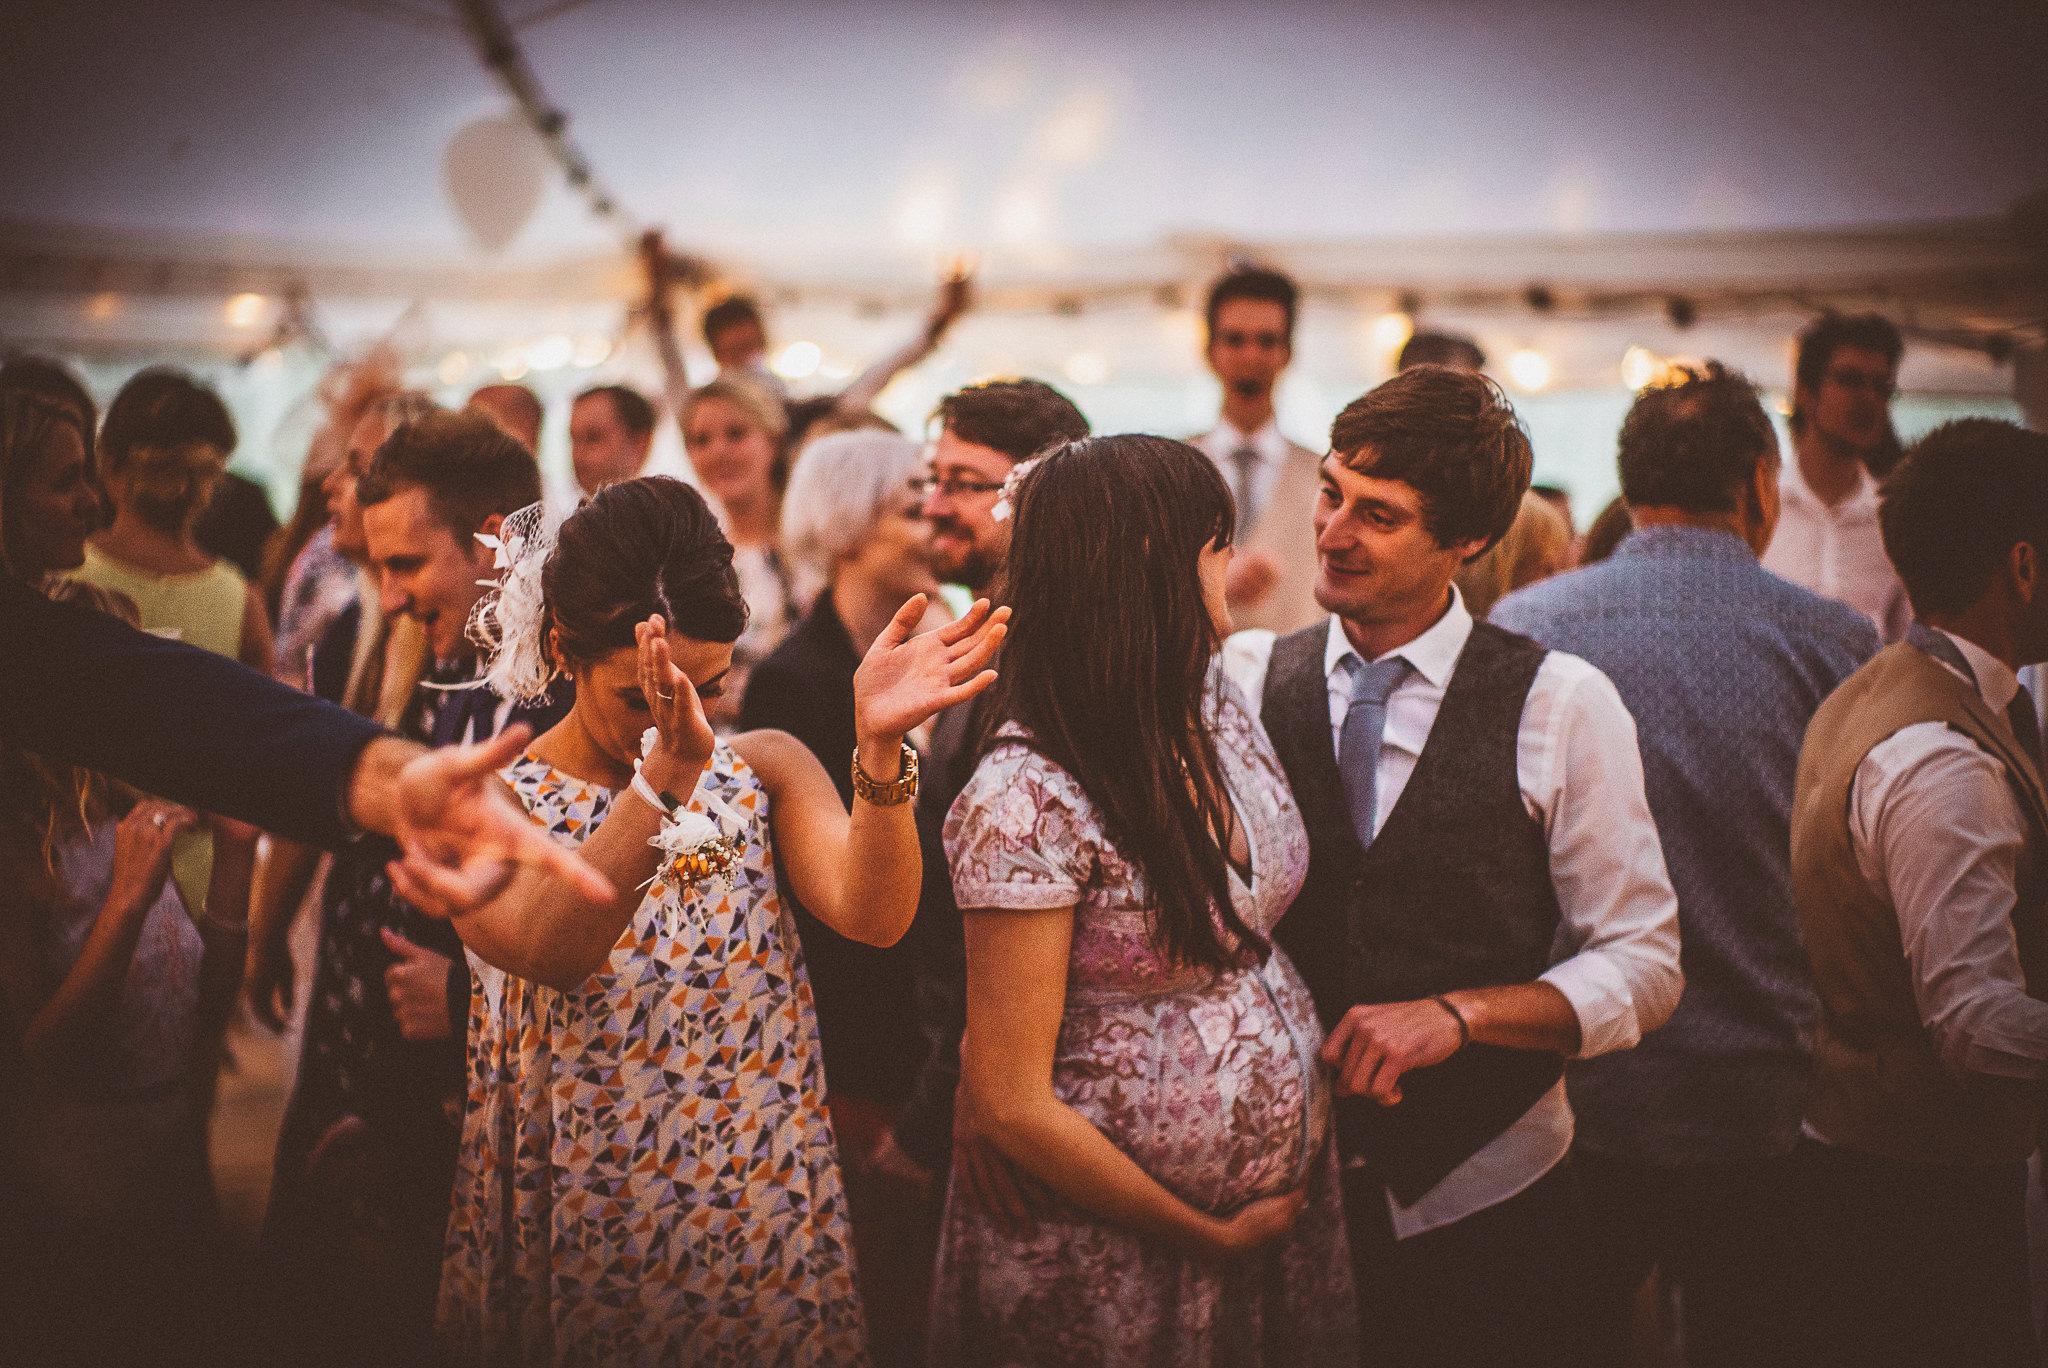 paul-marbrook-Farm-Wedding-Photographer-Lancashire-90111